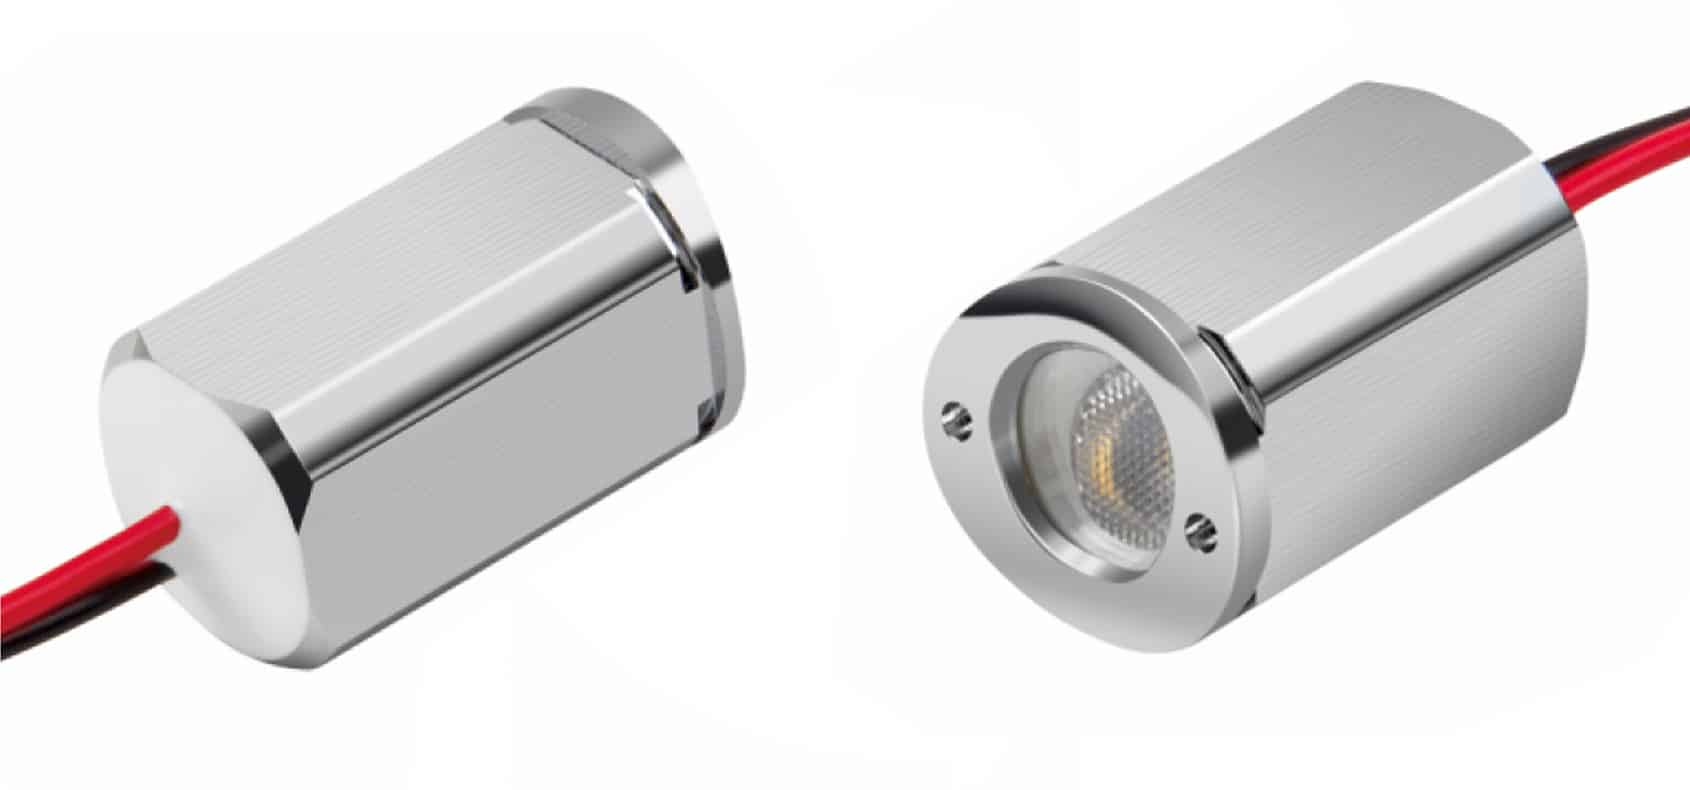 LED Aluminium Profile - Handrail Profile -M20